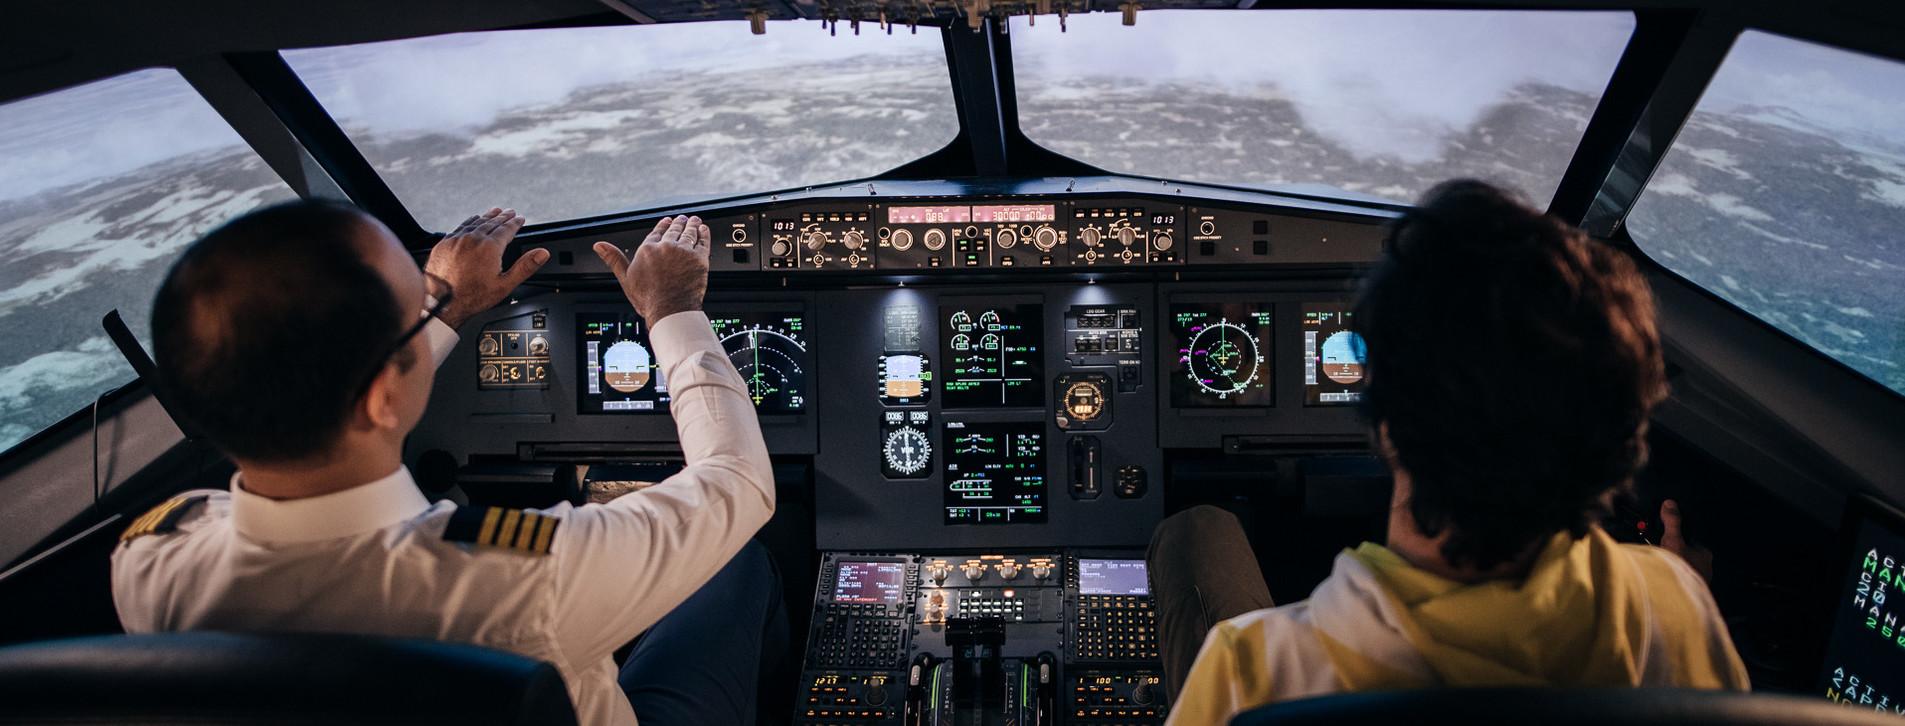 Fotoğraf 1 - Airbus A320 Uçuş Simülatörü Deneyimi